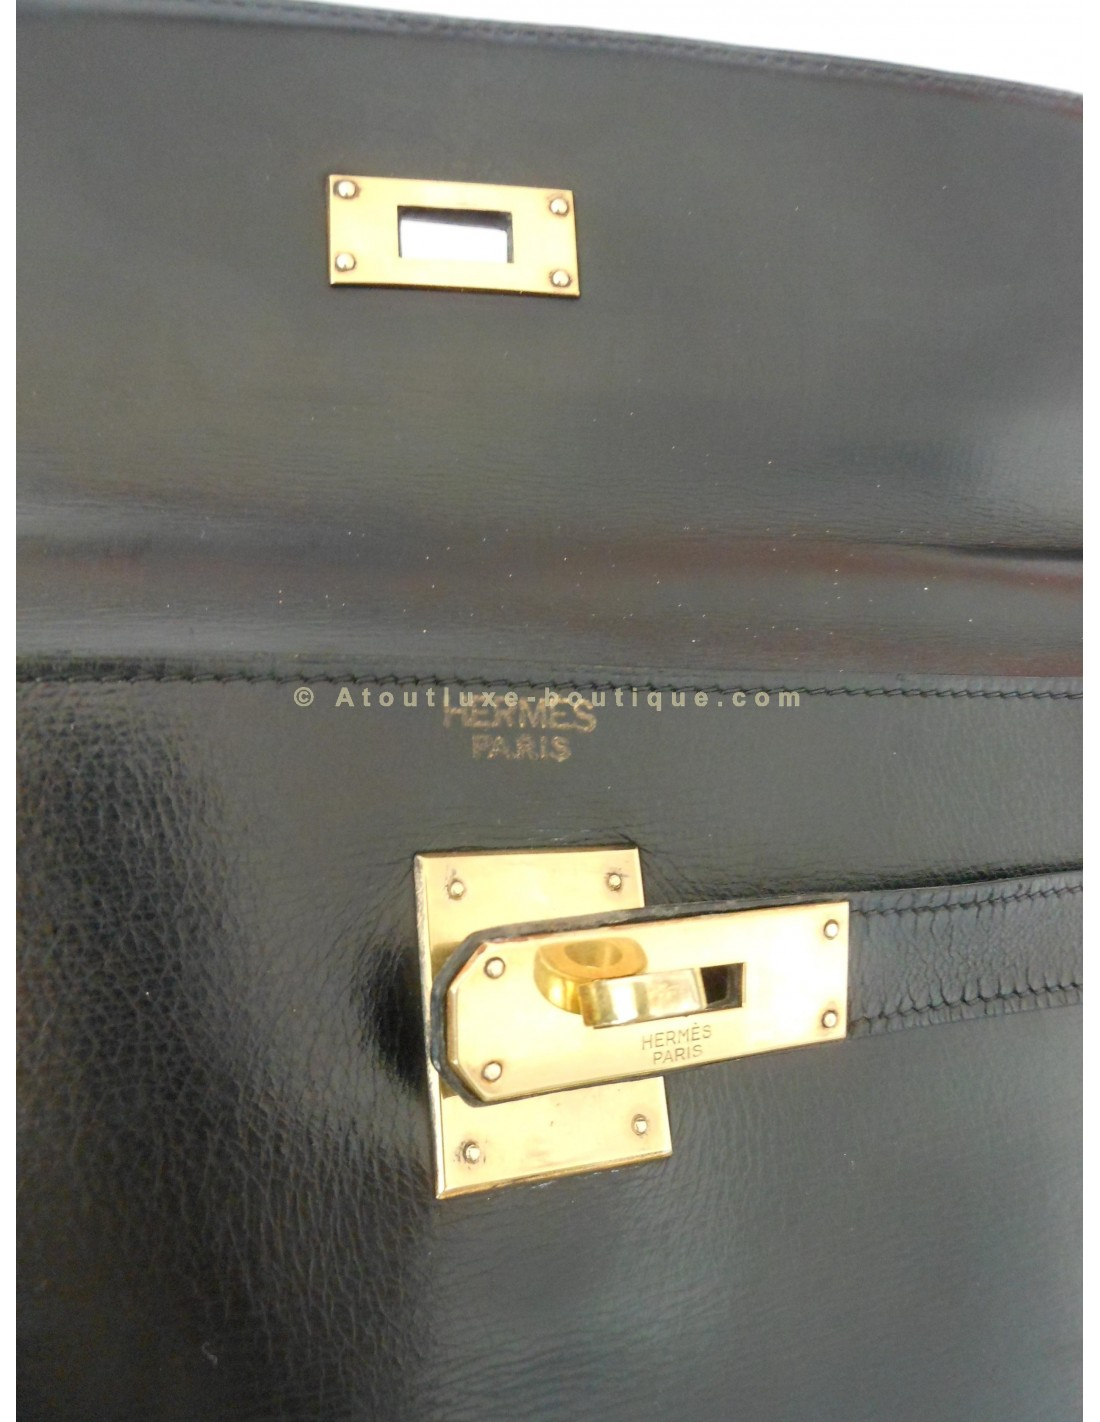 SAC HERMES KELLY 32 NOIR VINTAGE - Atoutluxe Boutique 13ace77aa6a